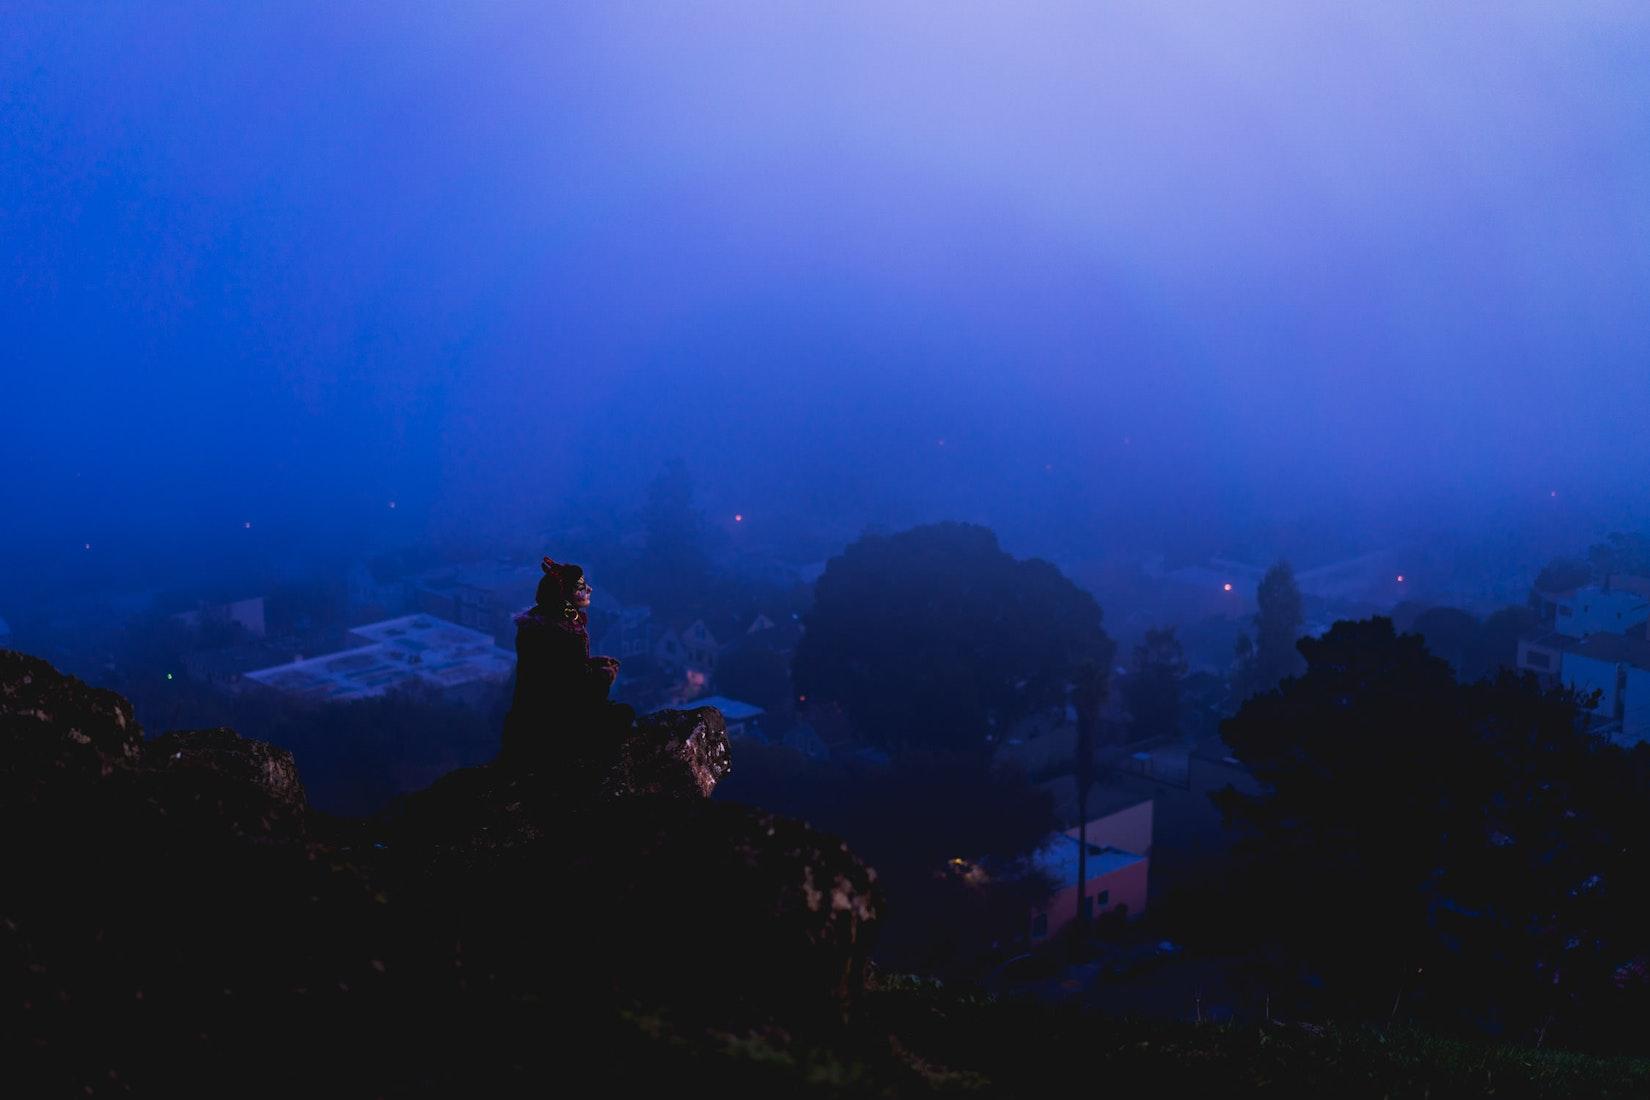 Morning fog in San Francisco